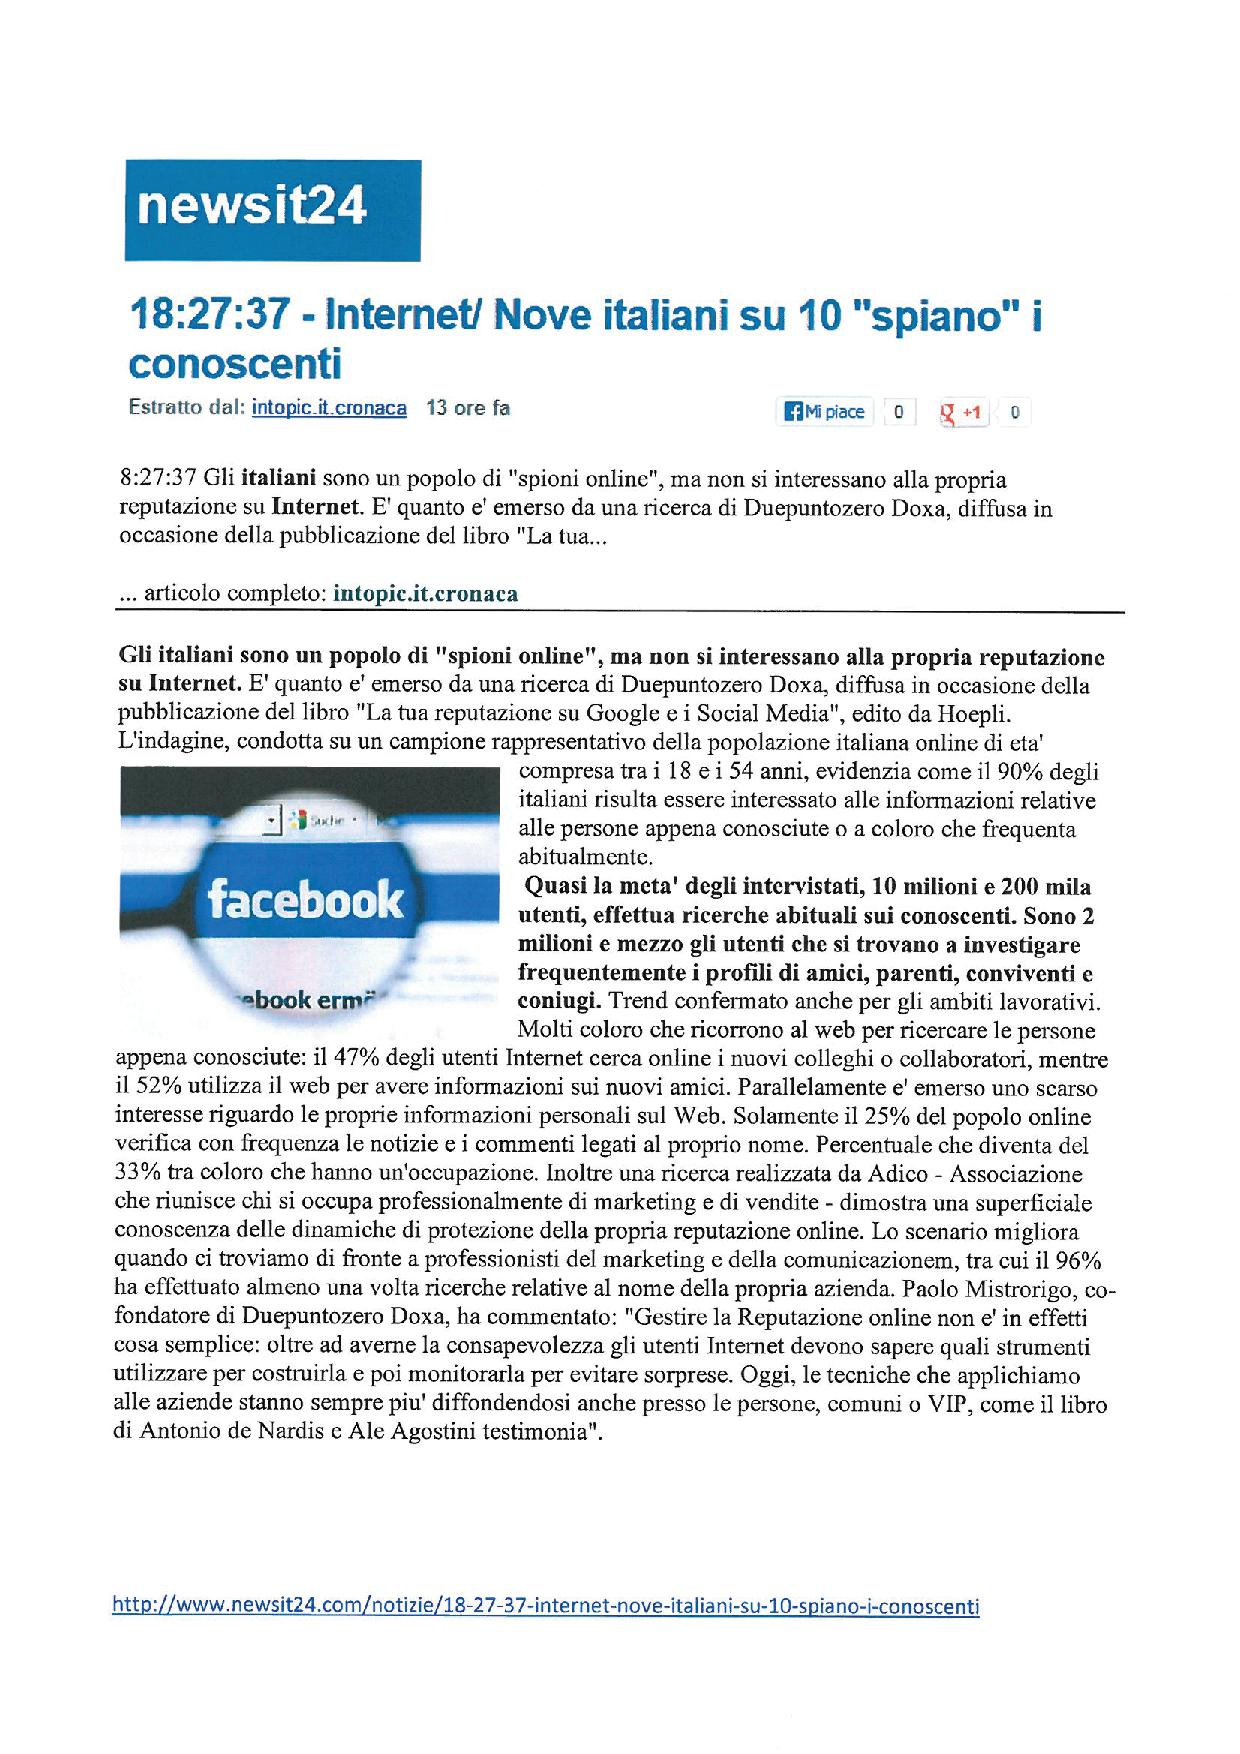 19.06.2013 Newsit24.com.pdf-001